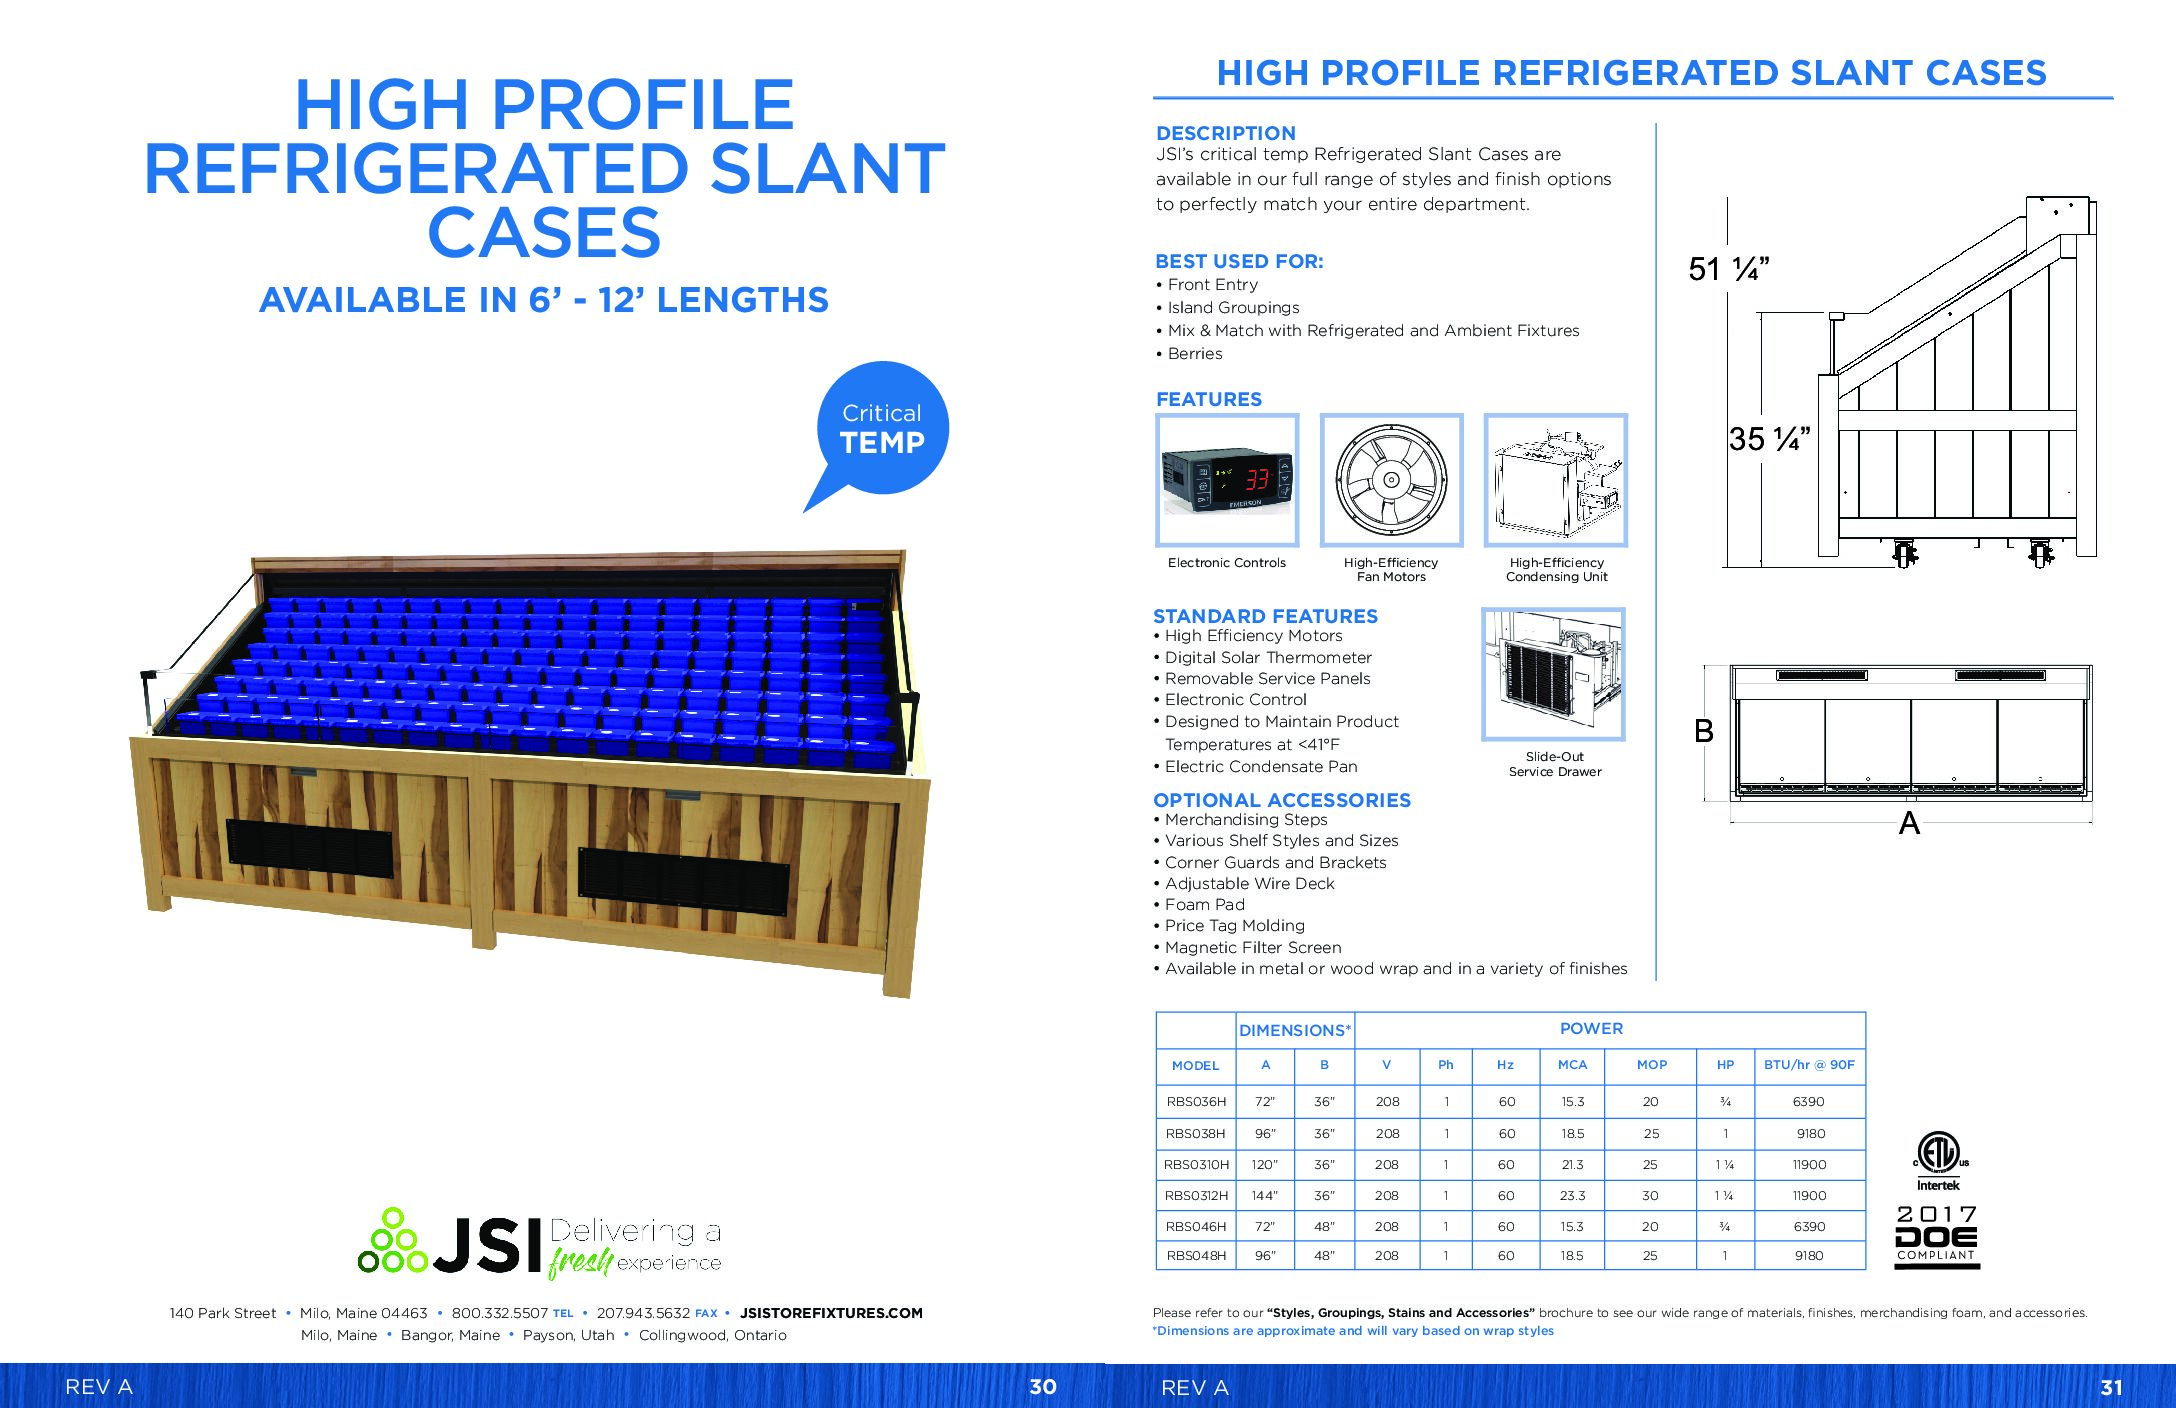 High Profile Refrigerated Slant Cases 6ft-12ft (PDF)